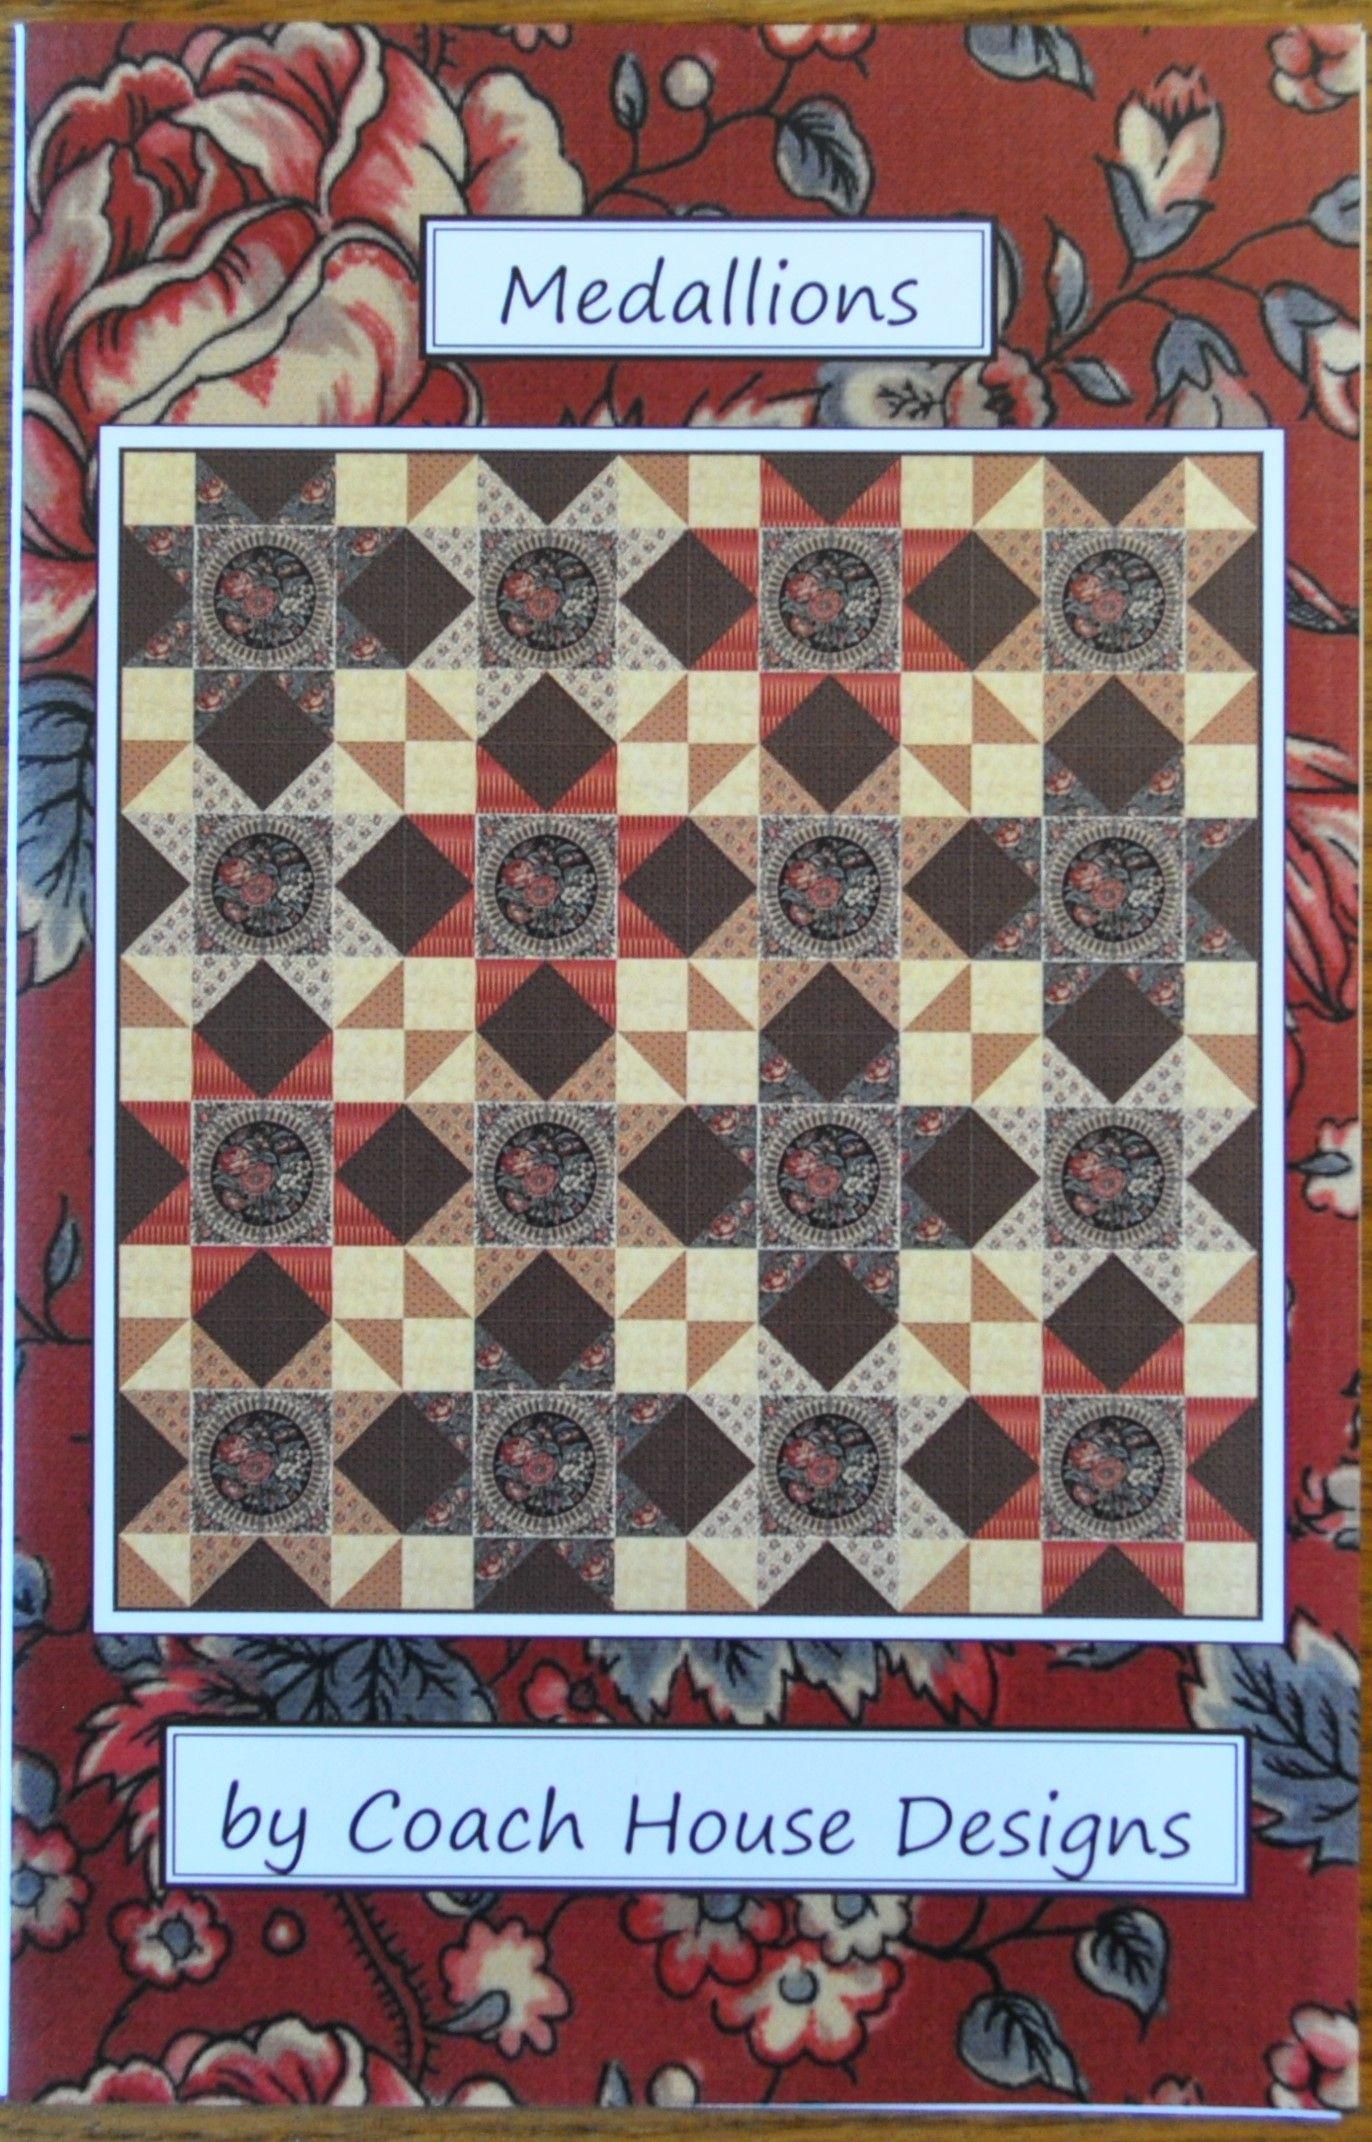 Coach House Designs quilt pattern by Barbara Cherniwchan ...